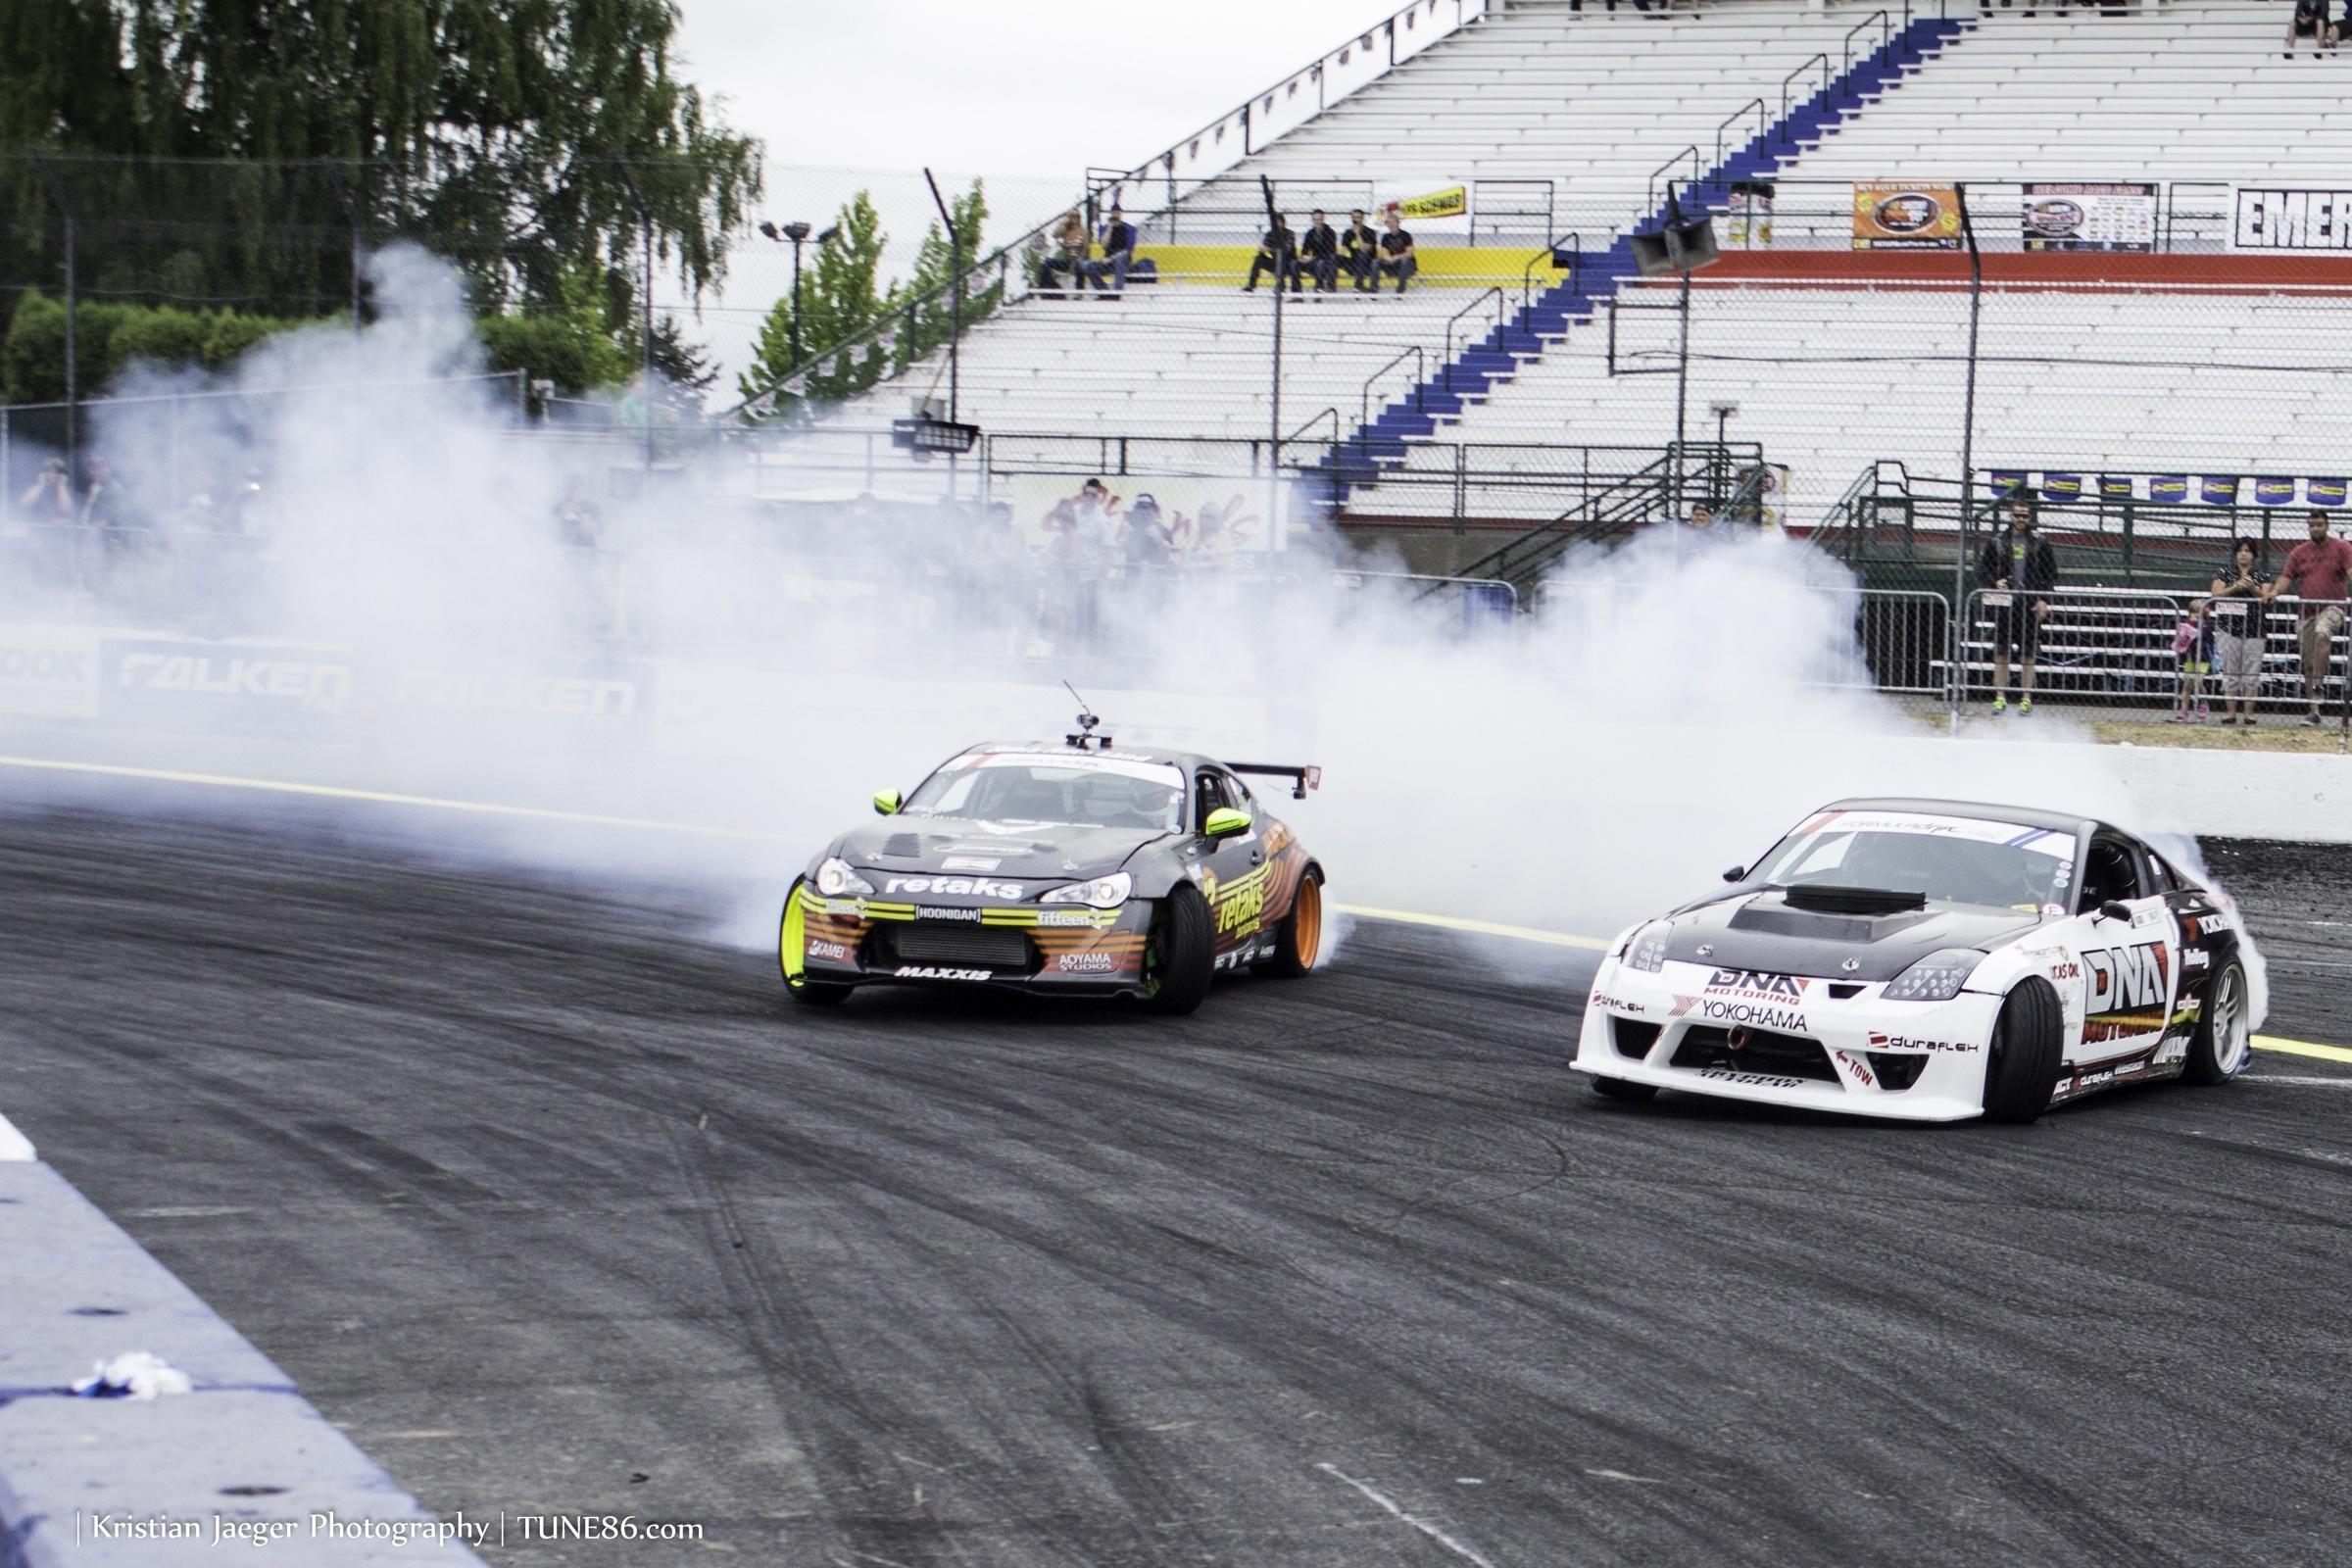 Formula Drift Seattle Ryan Tuerck 2jz FRS02